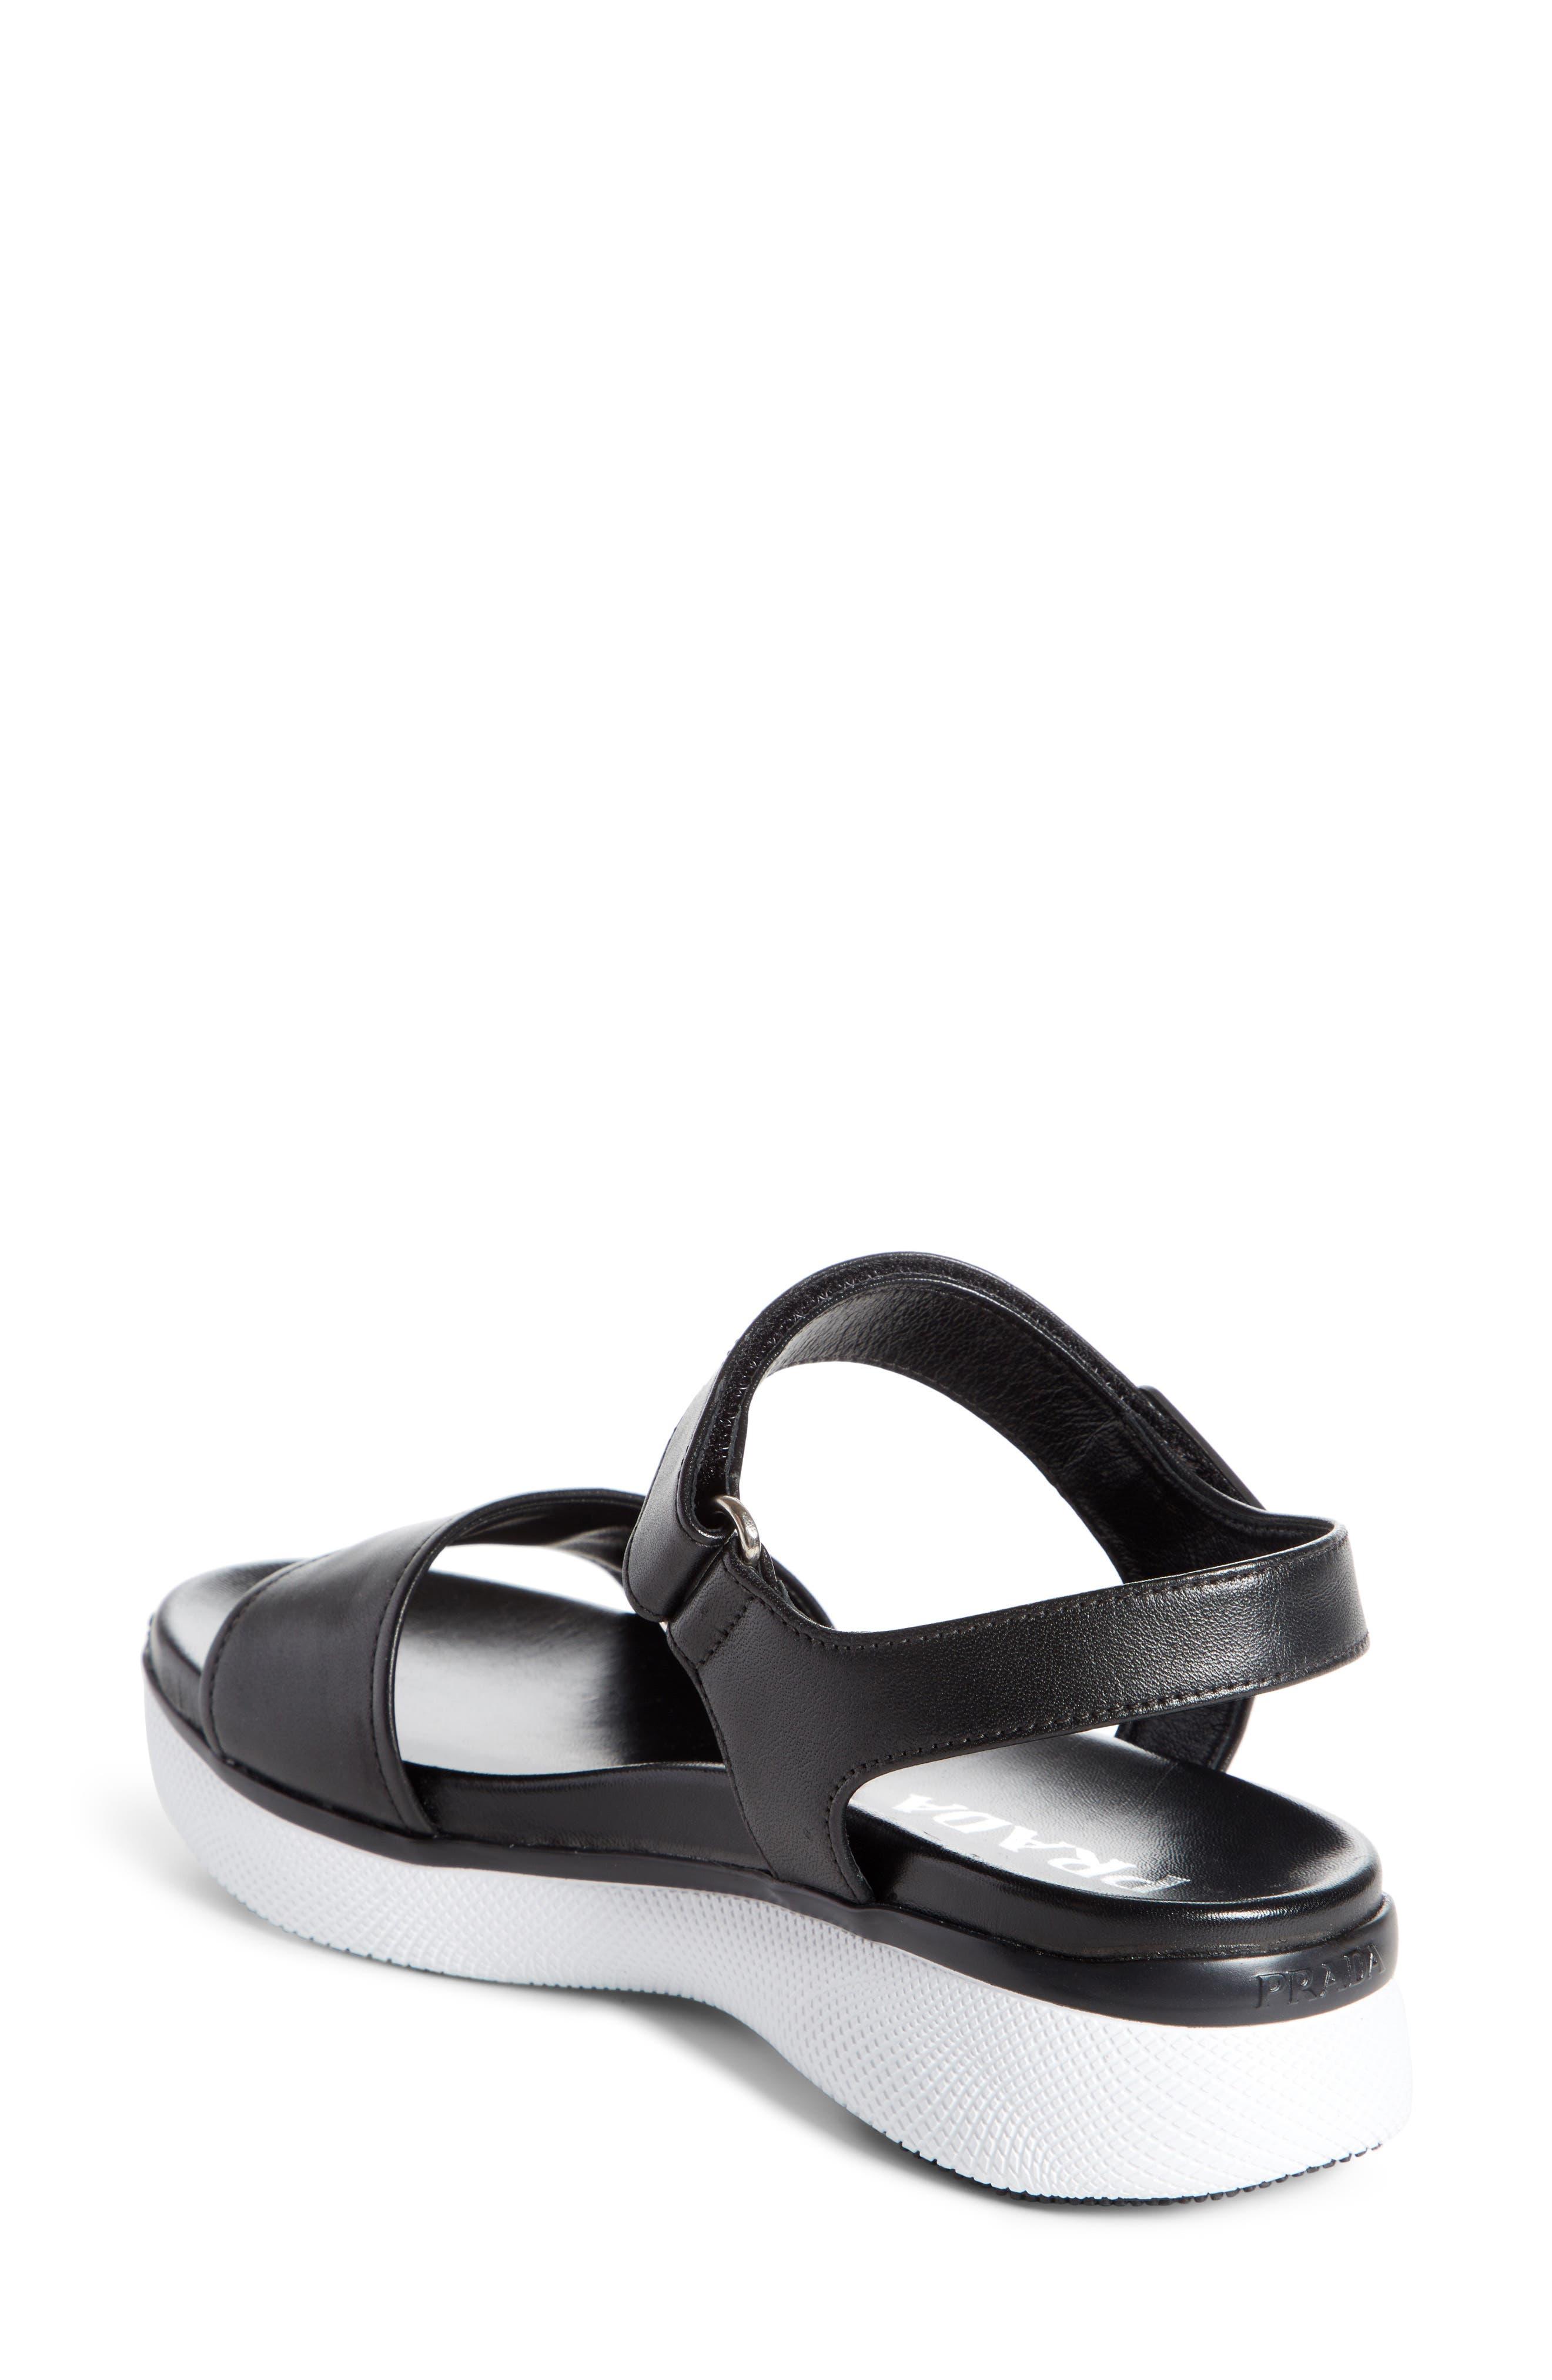 Platform Sandal,                             Alternate thumbnail 2, color,                             Black/ White